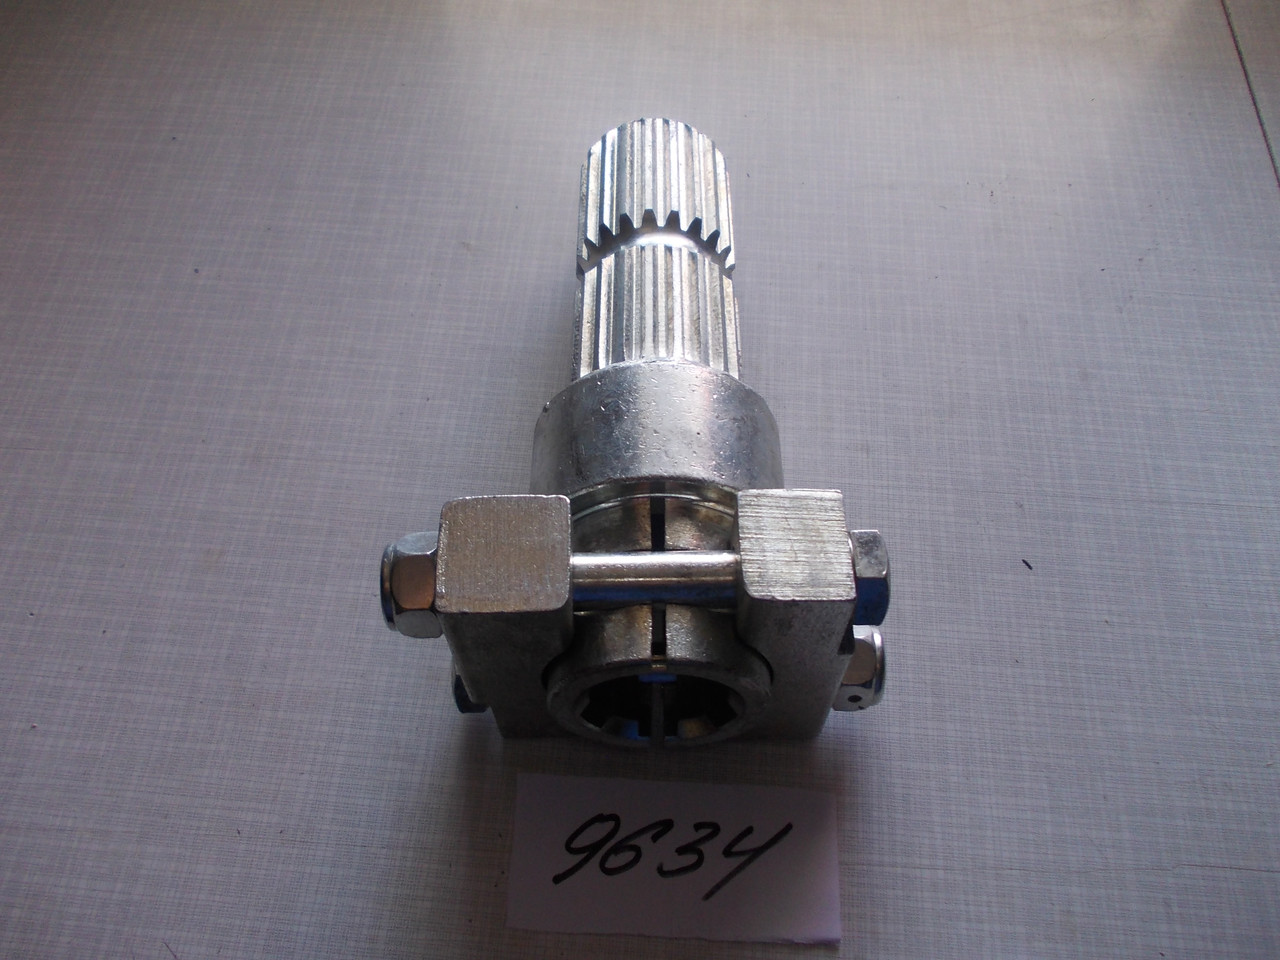 Адаптер (переходник) ВОМ (с втулки Z 6 на вал Z 20) усиленный